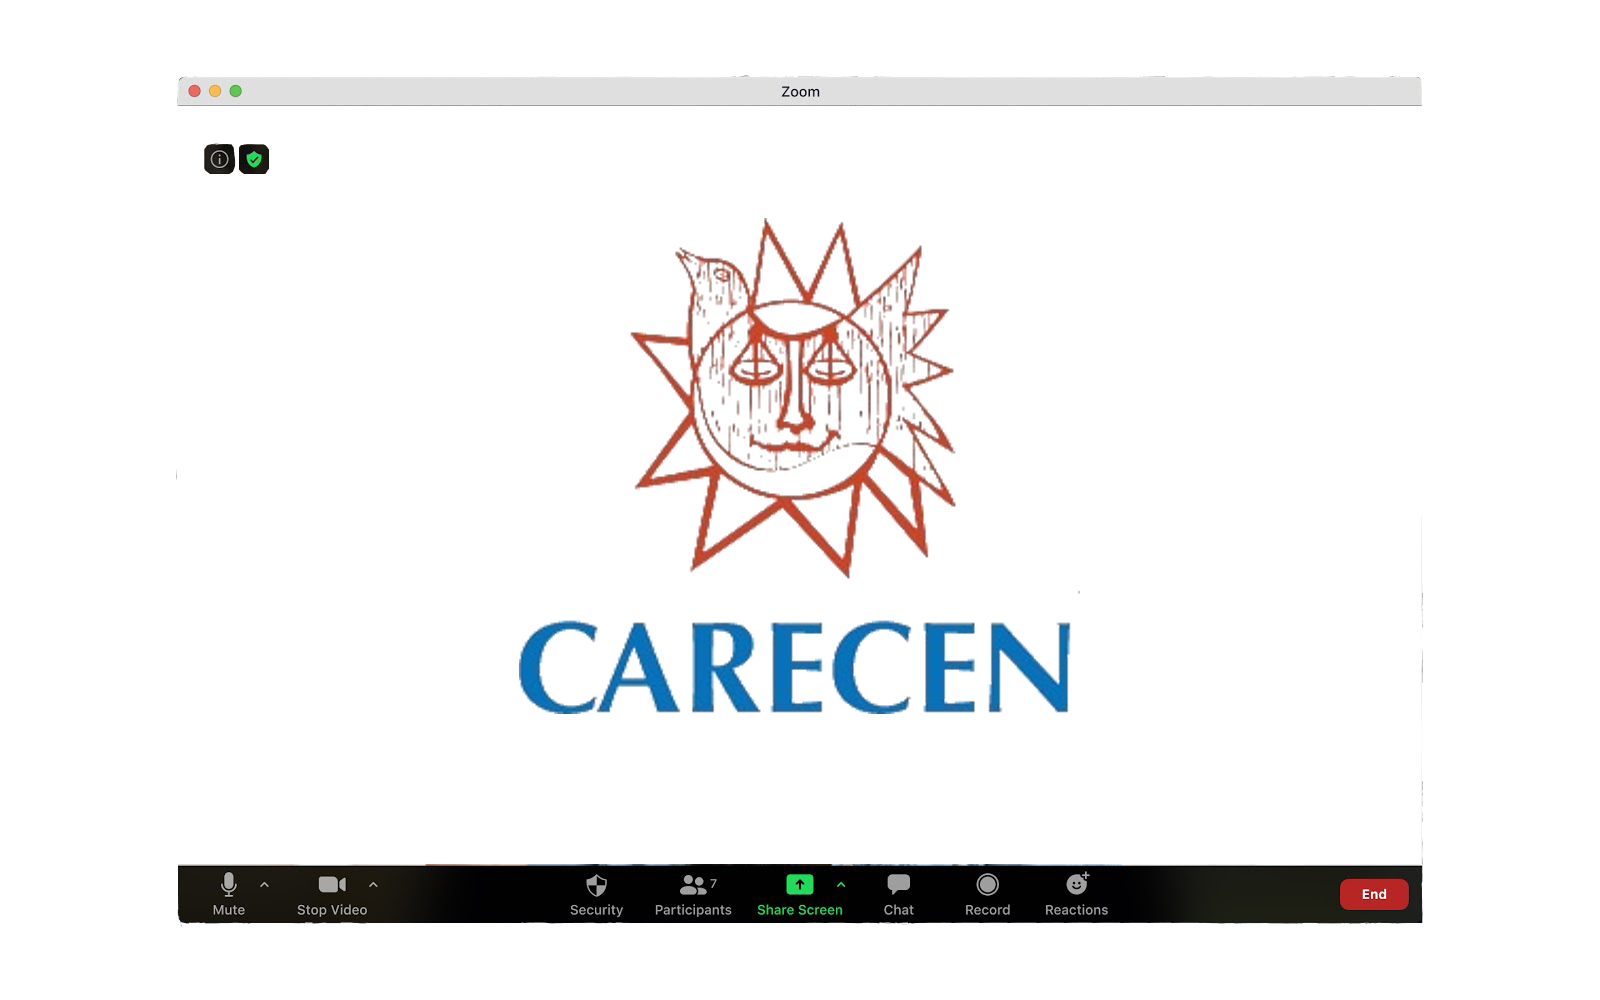 CARECEN Zoom